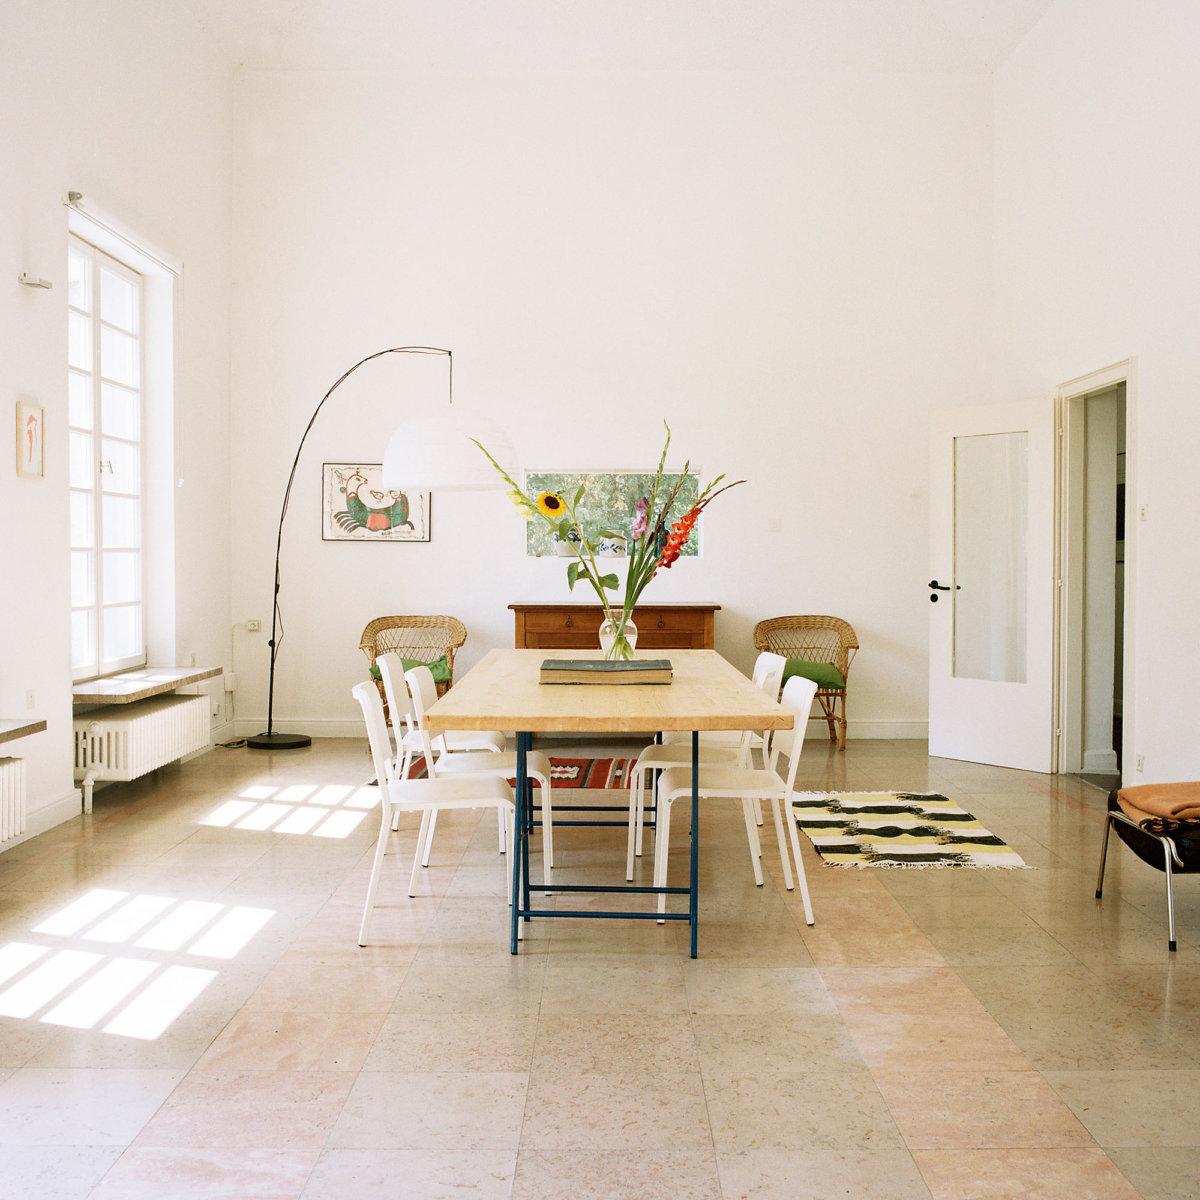 Interiors II – Tina Hillier - CRXSS